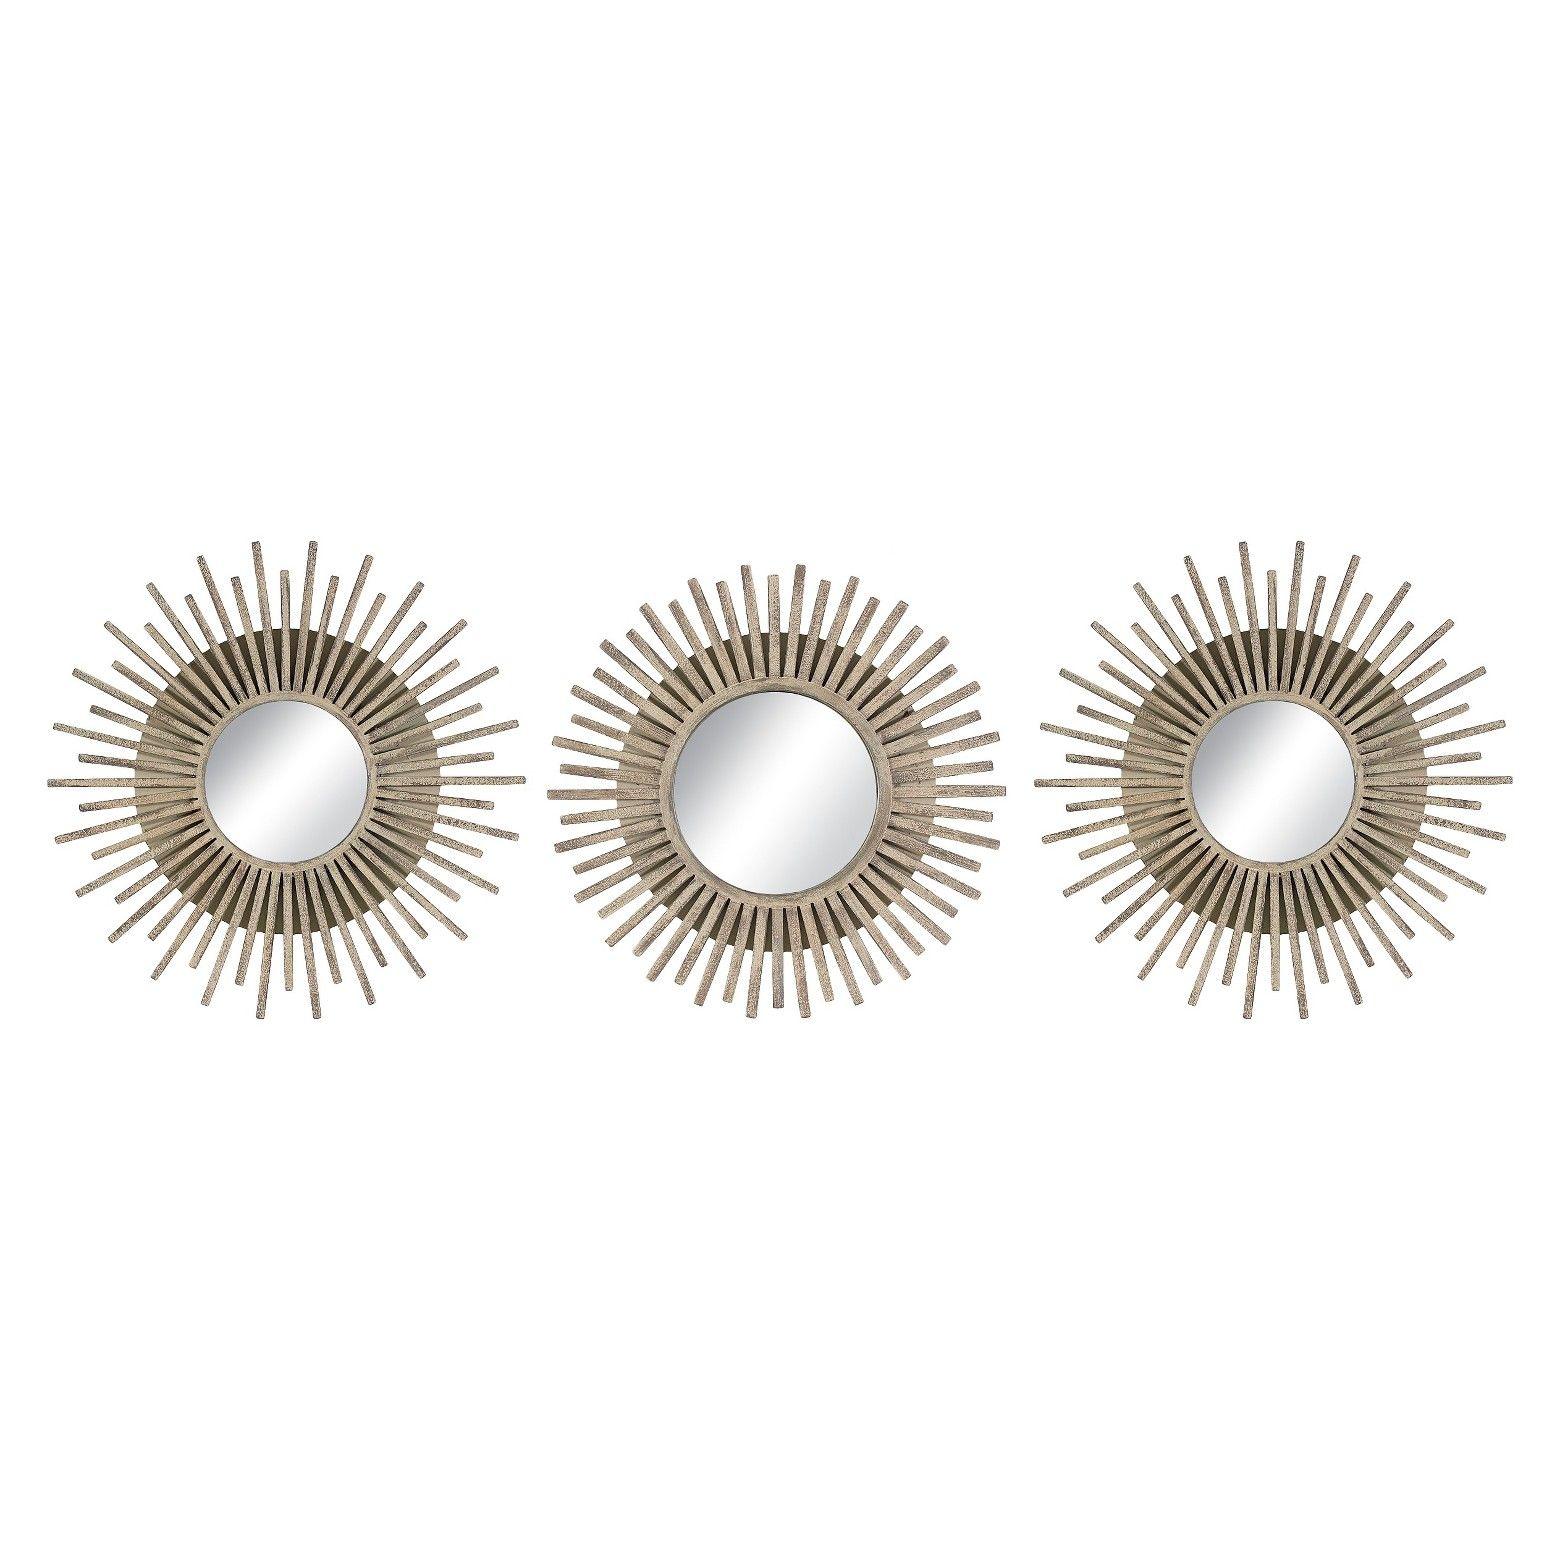 Starburst Gold Accent Mirrors 3 pack Threshold